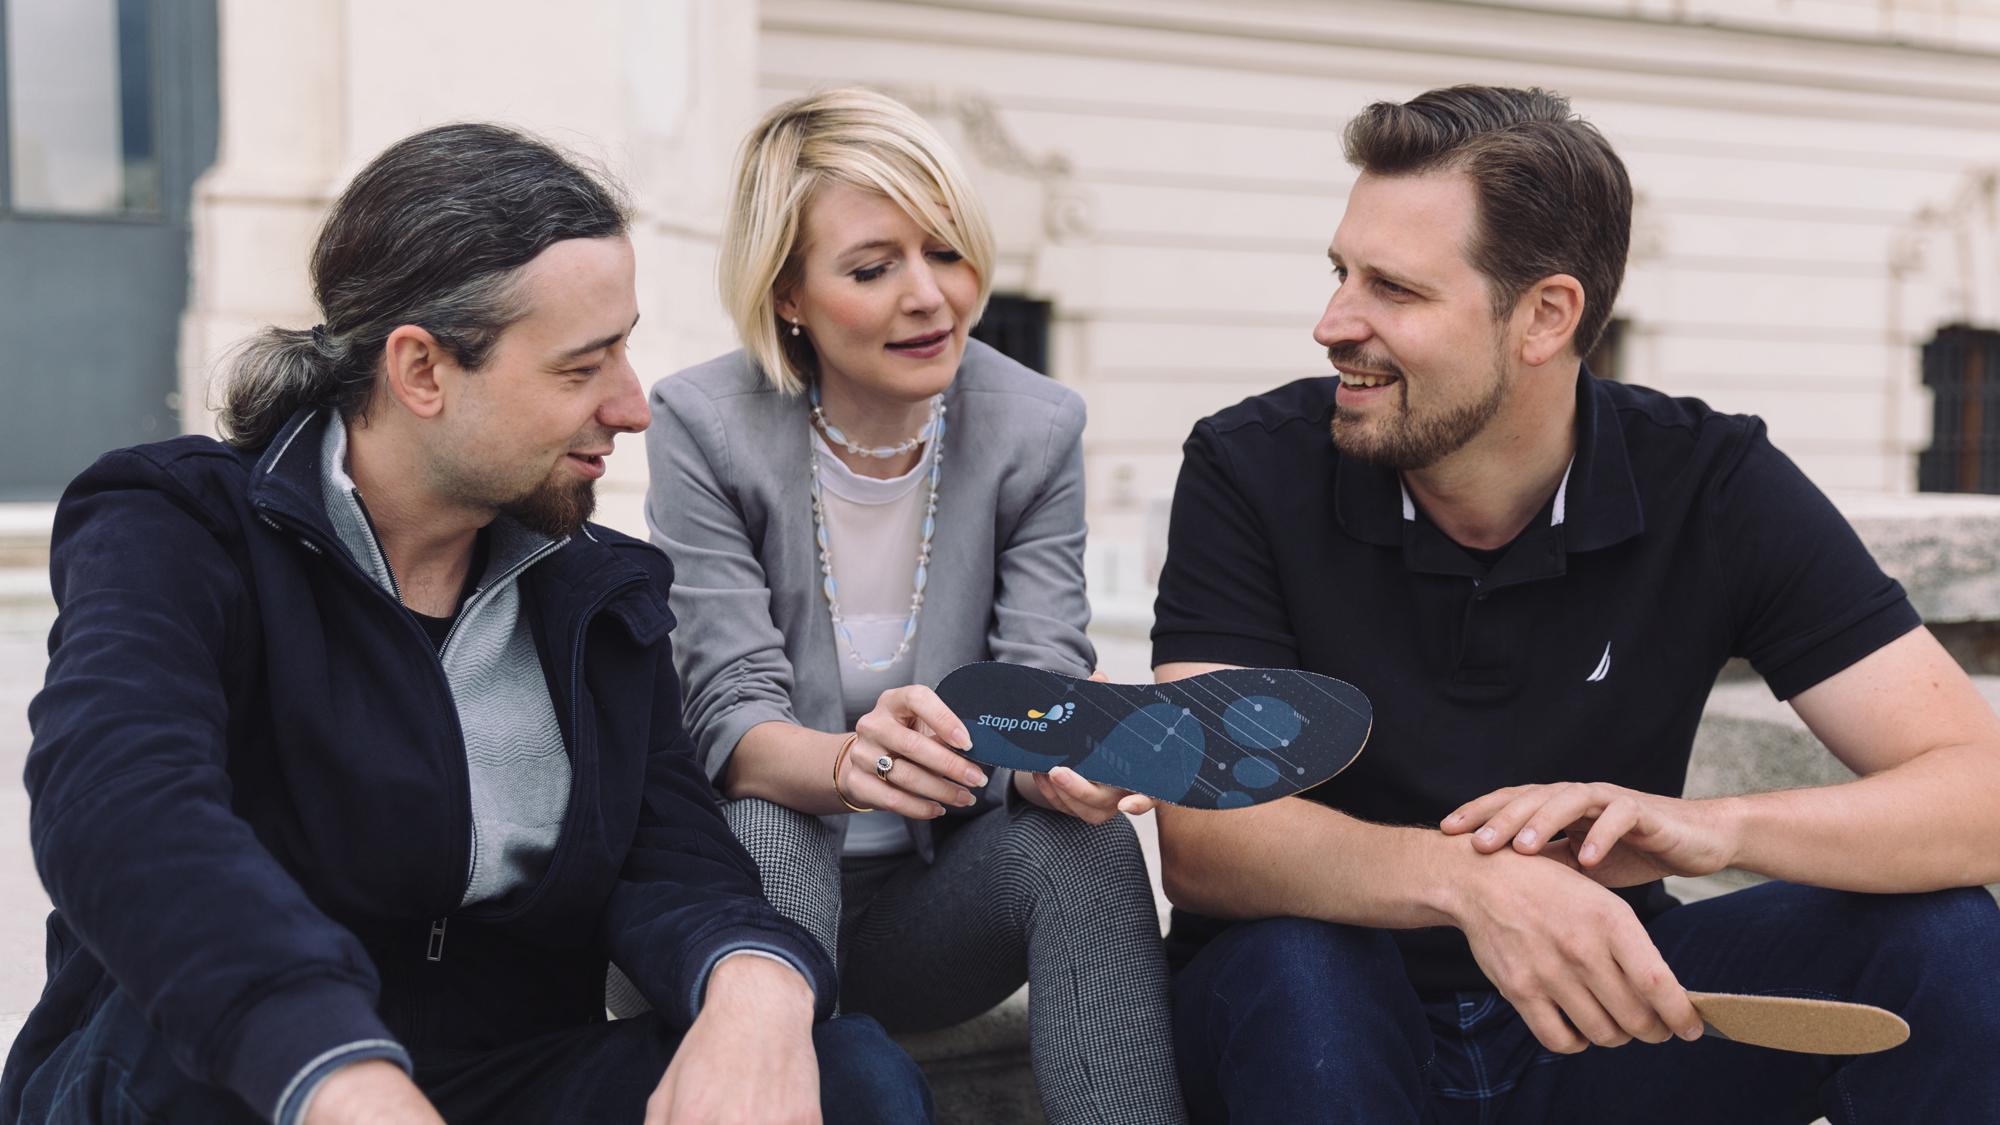 Das Stapptronics-Team: Philipp Olbricht, Sylvia Strell und Peter Krimmer. © Stapptronics